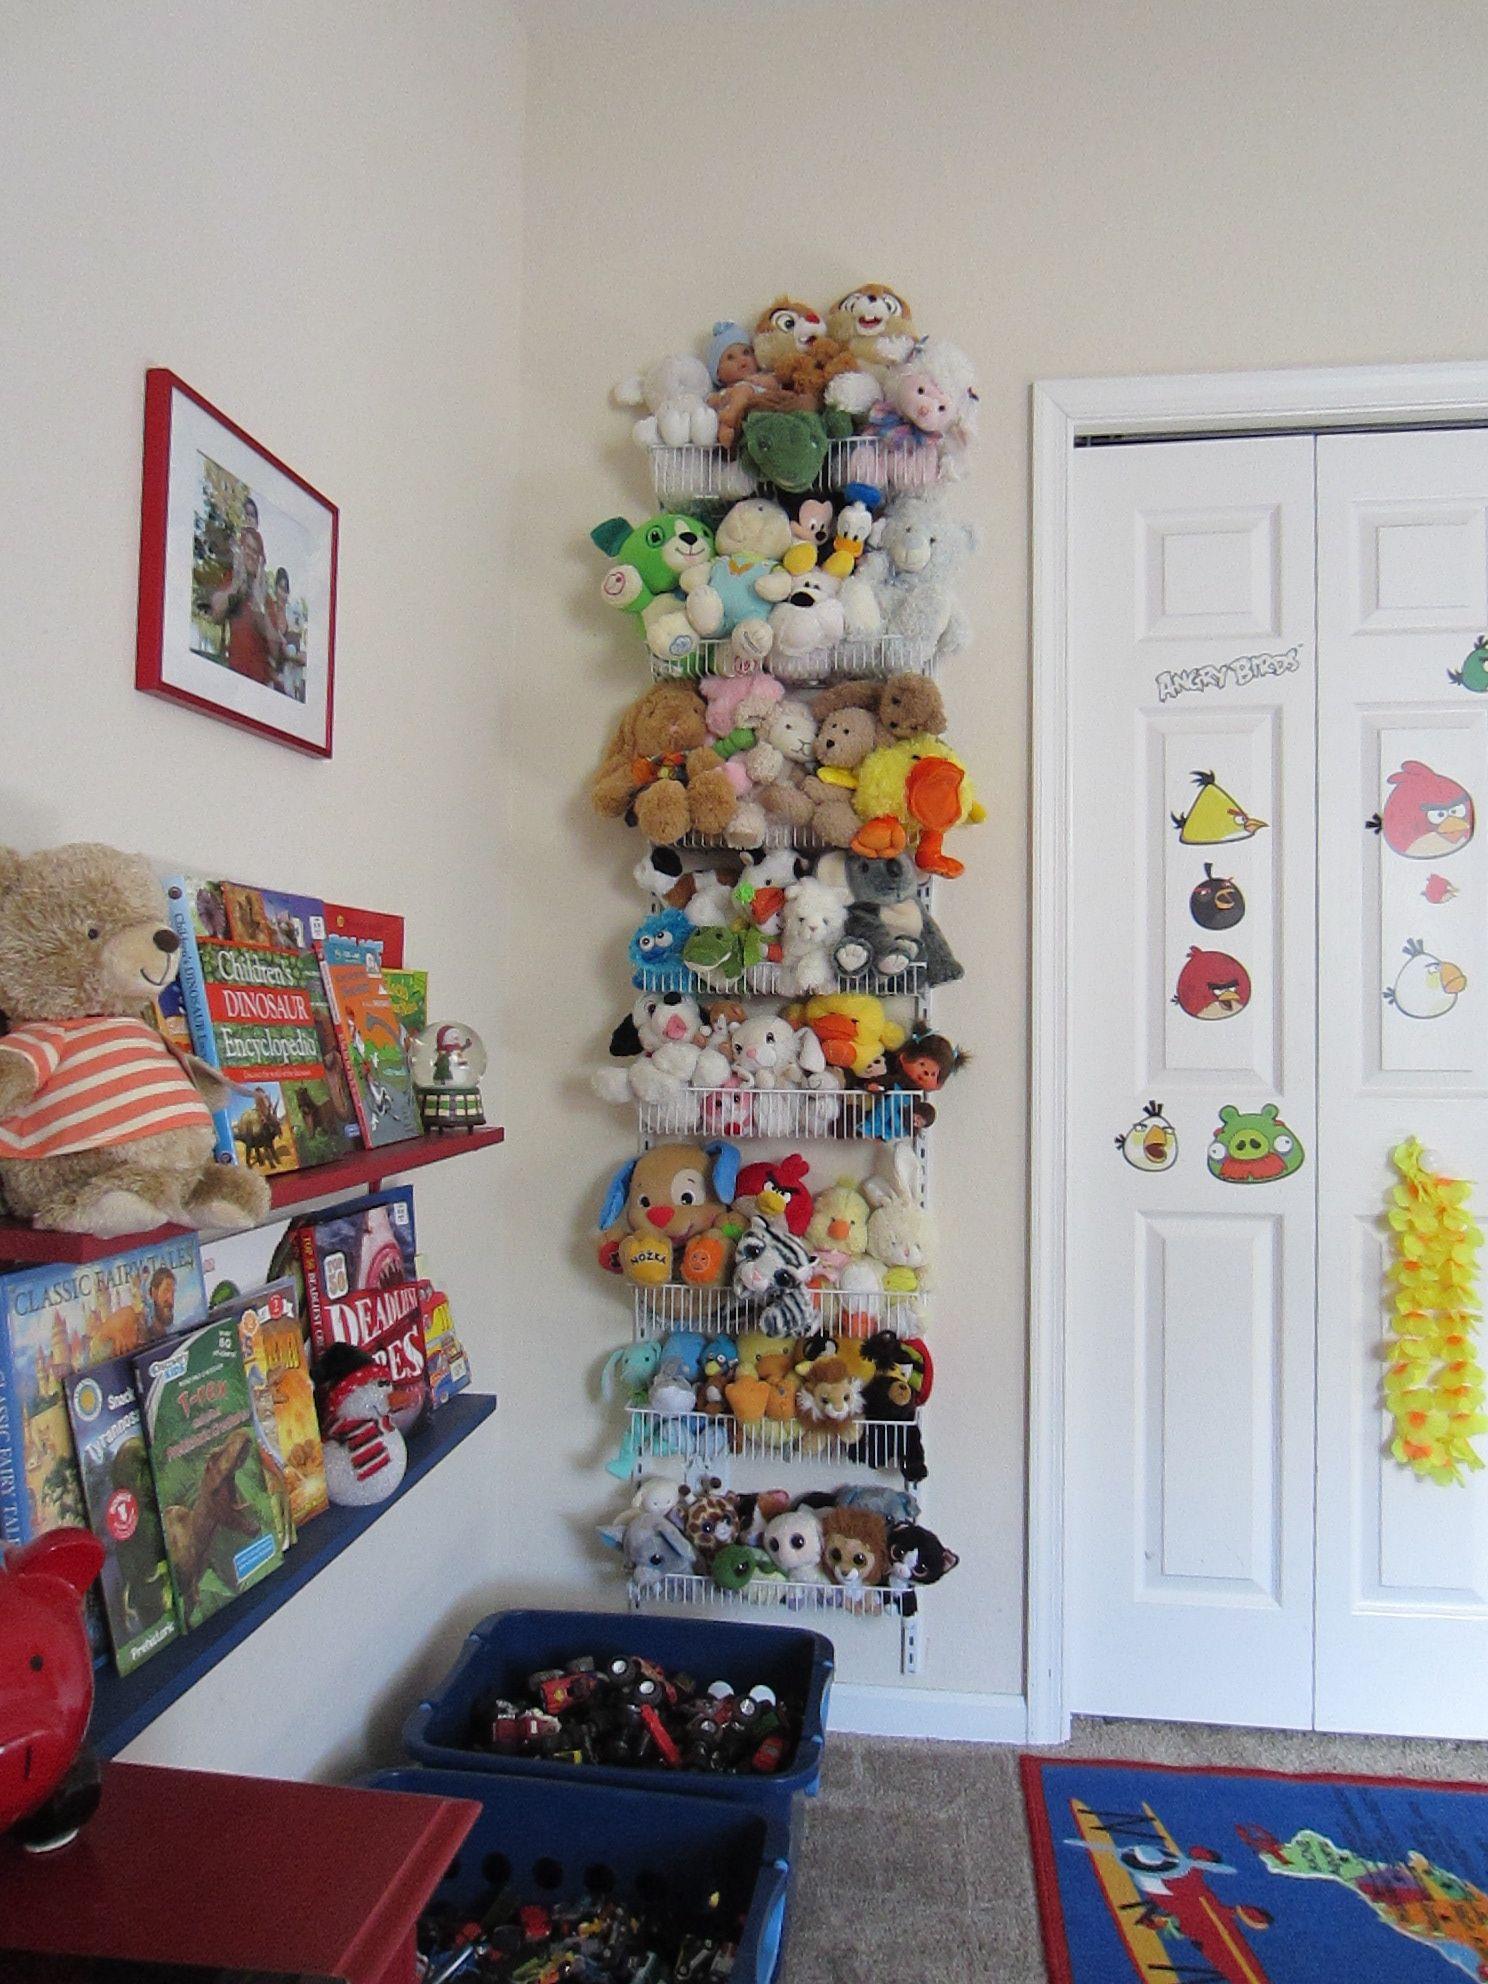 Stuffed Animals Storage Closet Maid 8 Tier Adjustable